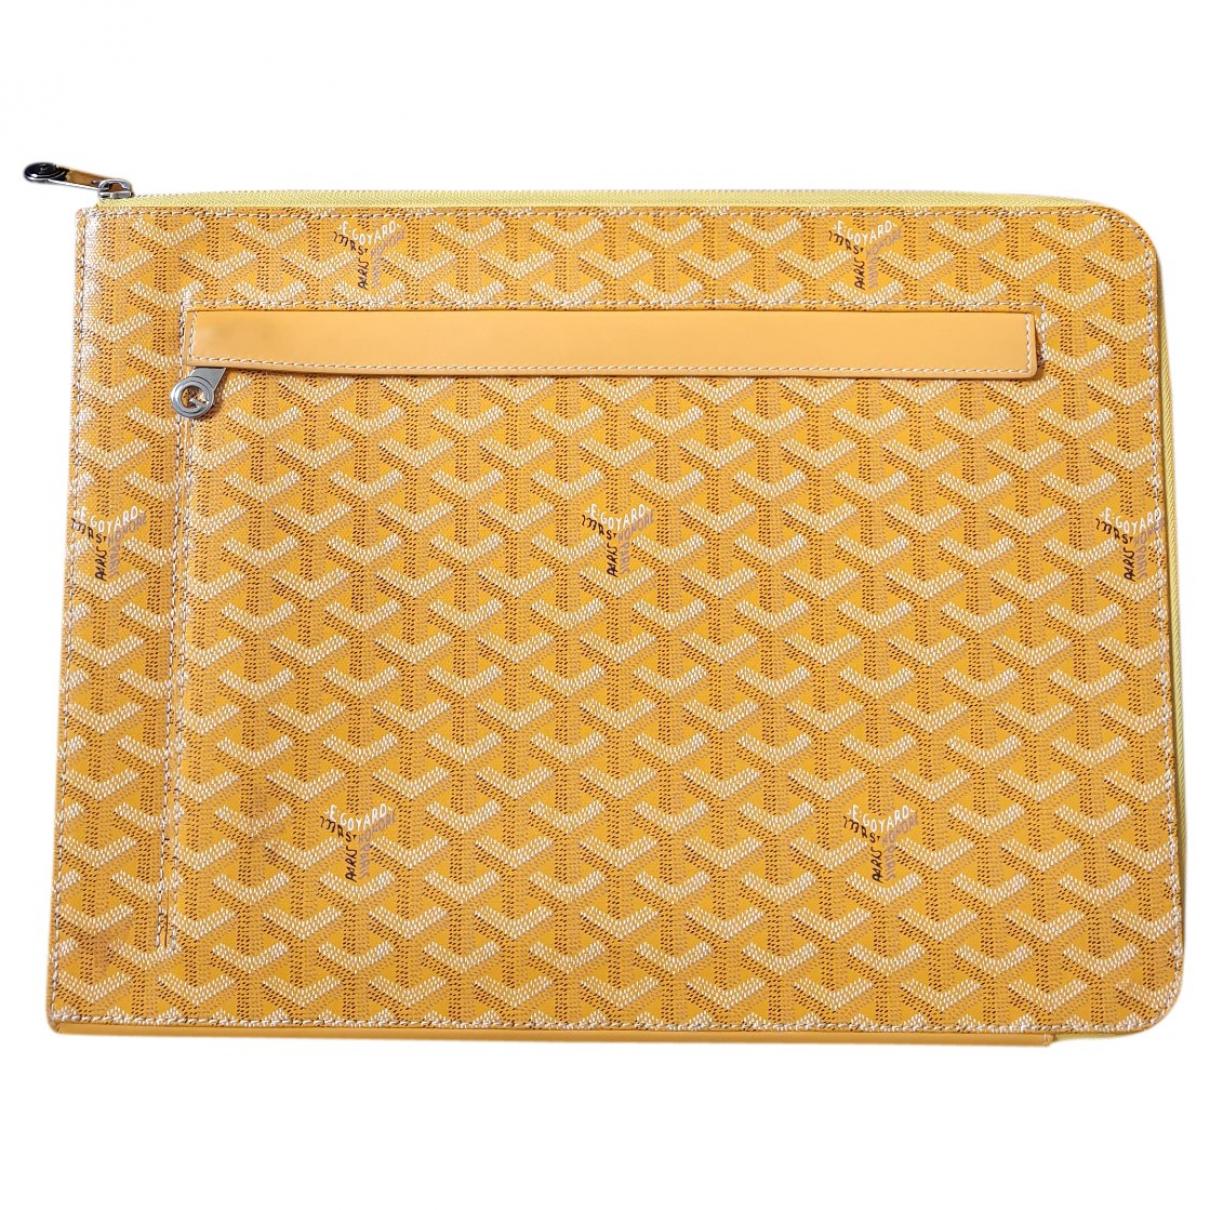 Goyard \N Yellow Cloth bag for Men \N